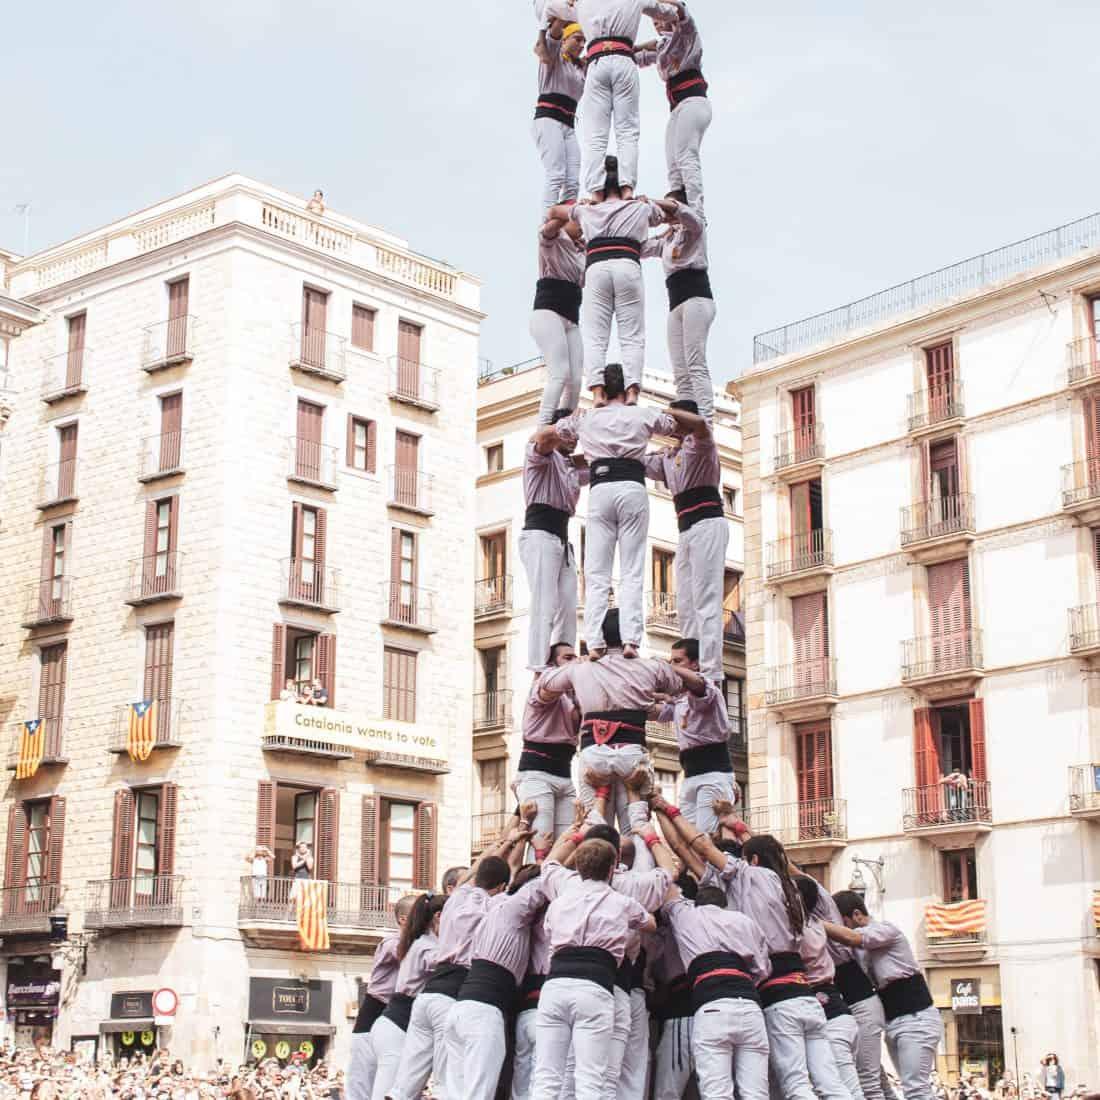 human tower event festivals Barcelona Catalonia